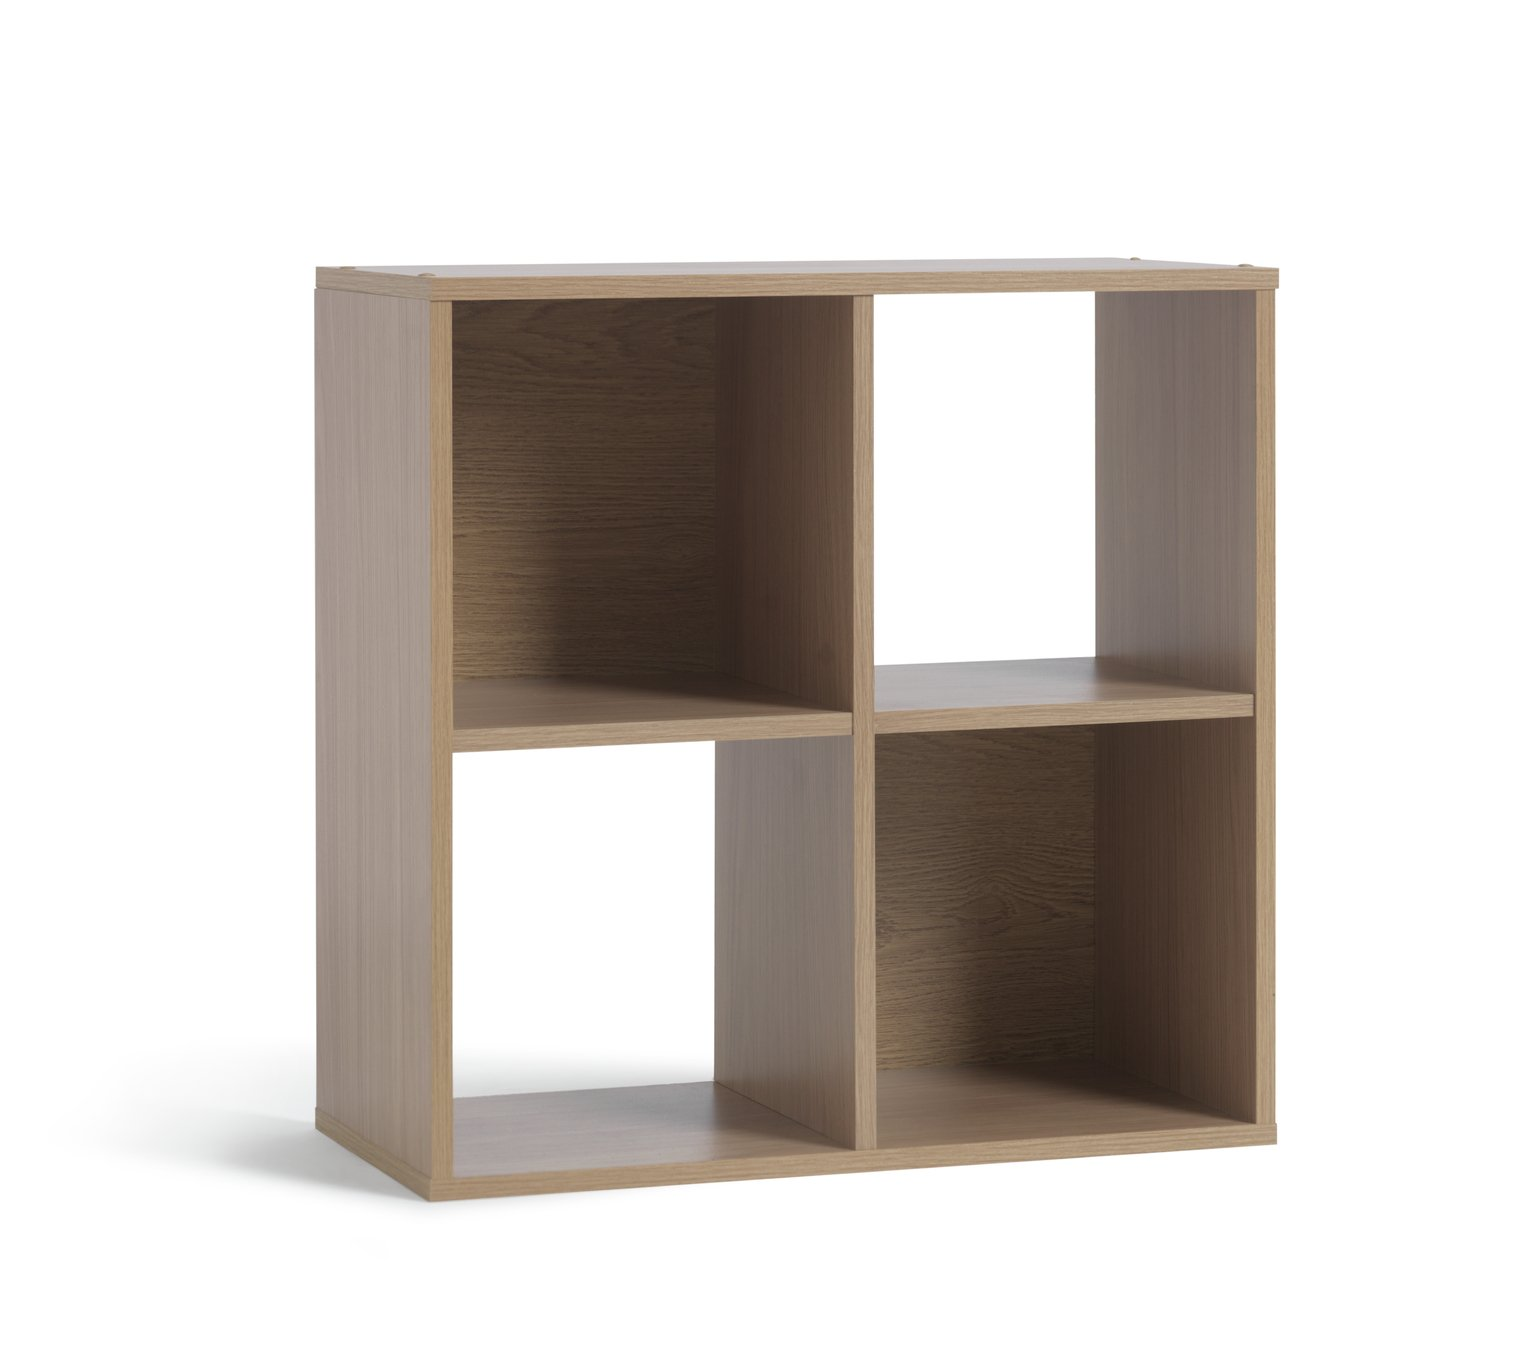 argos home squares 4 cube storage unit oak effect. Black Bedroom Furniture Sets. Home Design Ideas